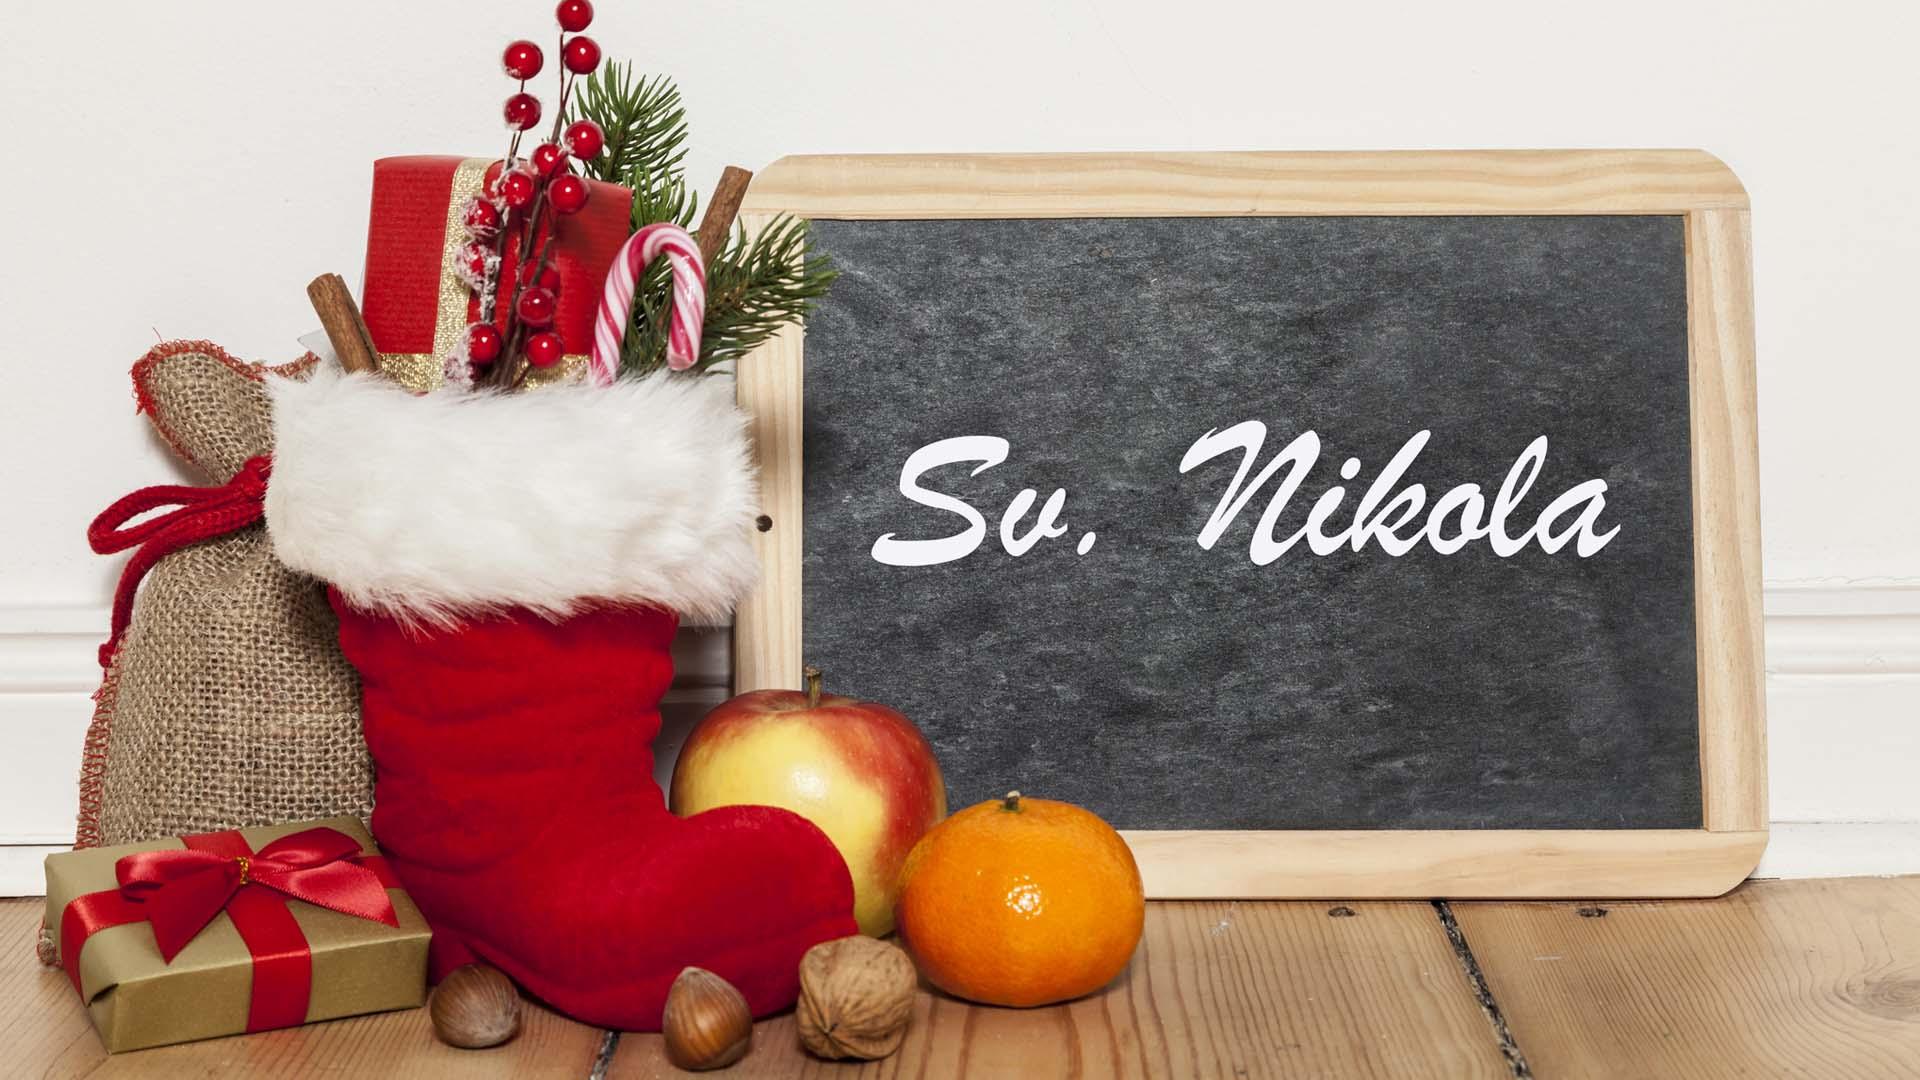 Adventsku i božićnu priču u GK Kaštela svečano otvorio sv. Nikola